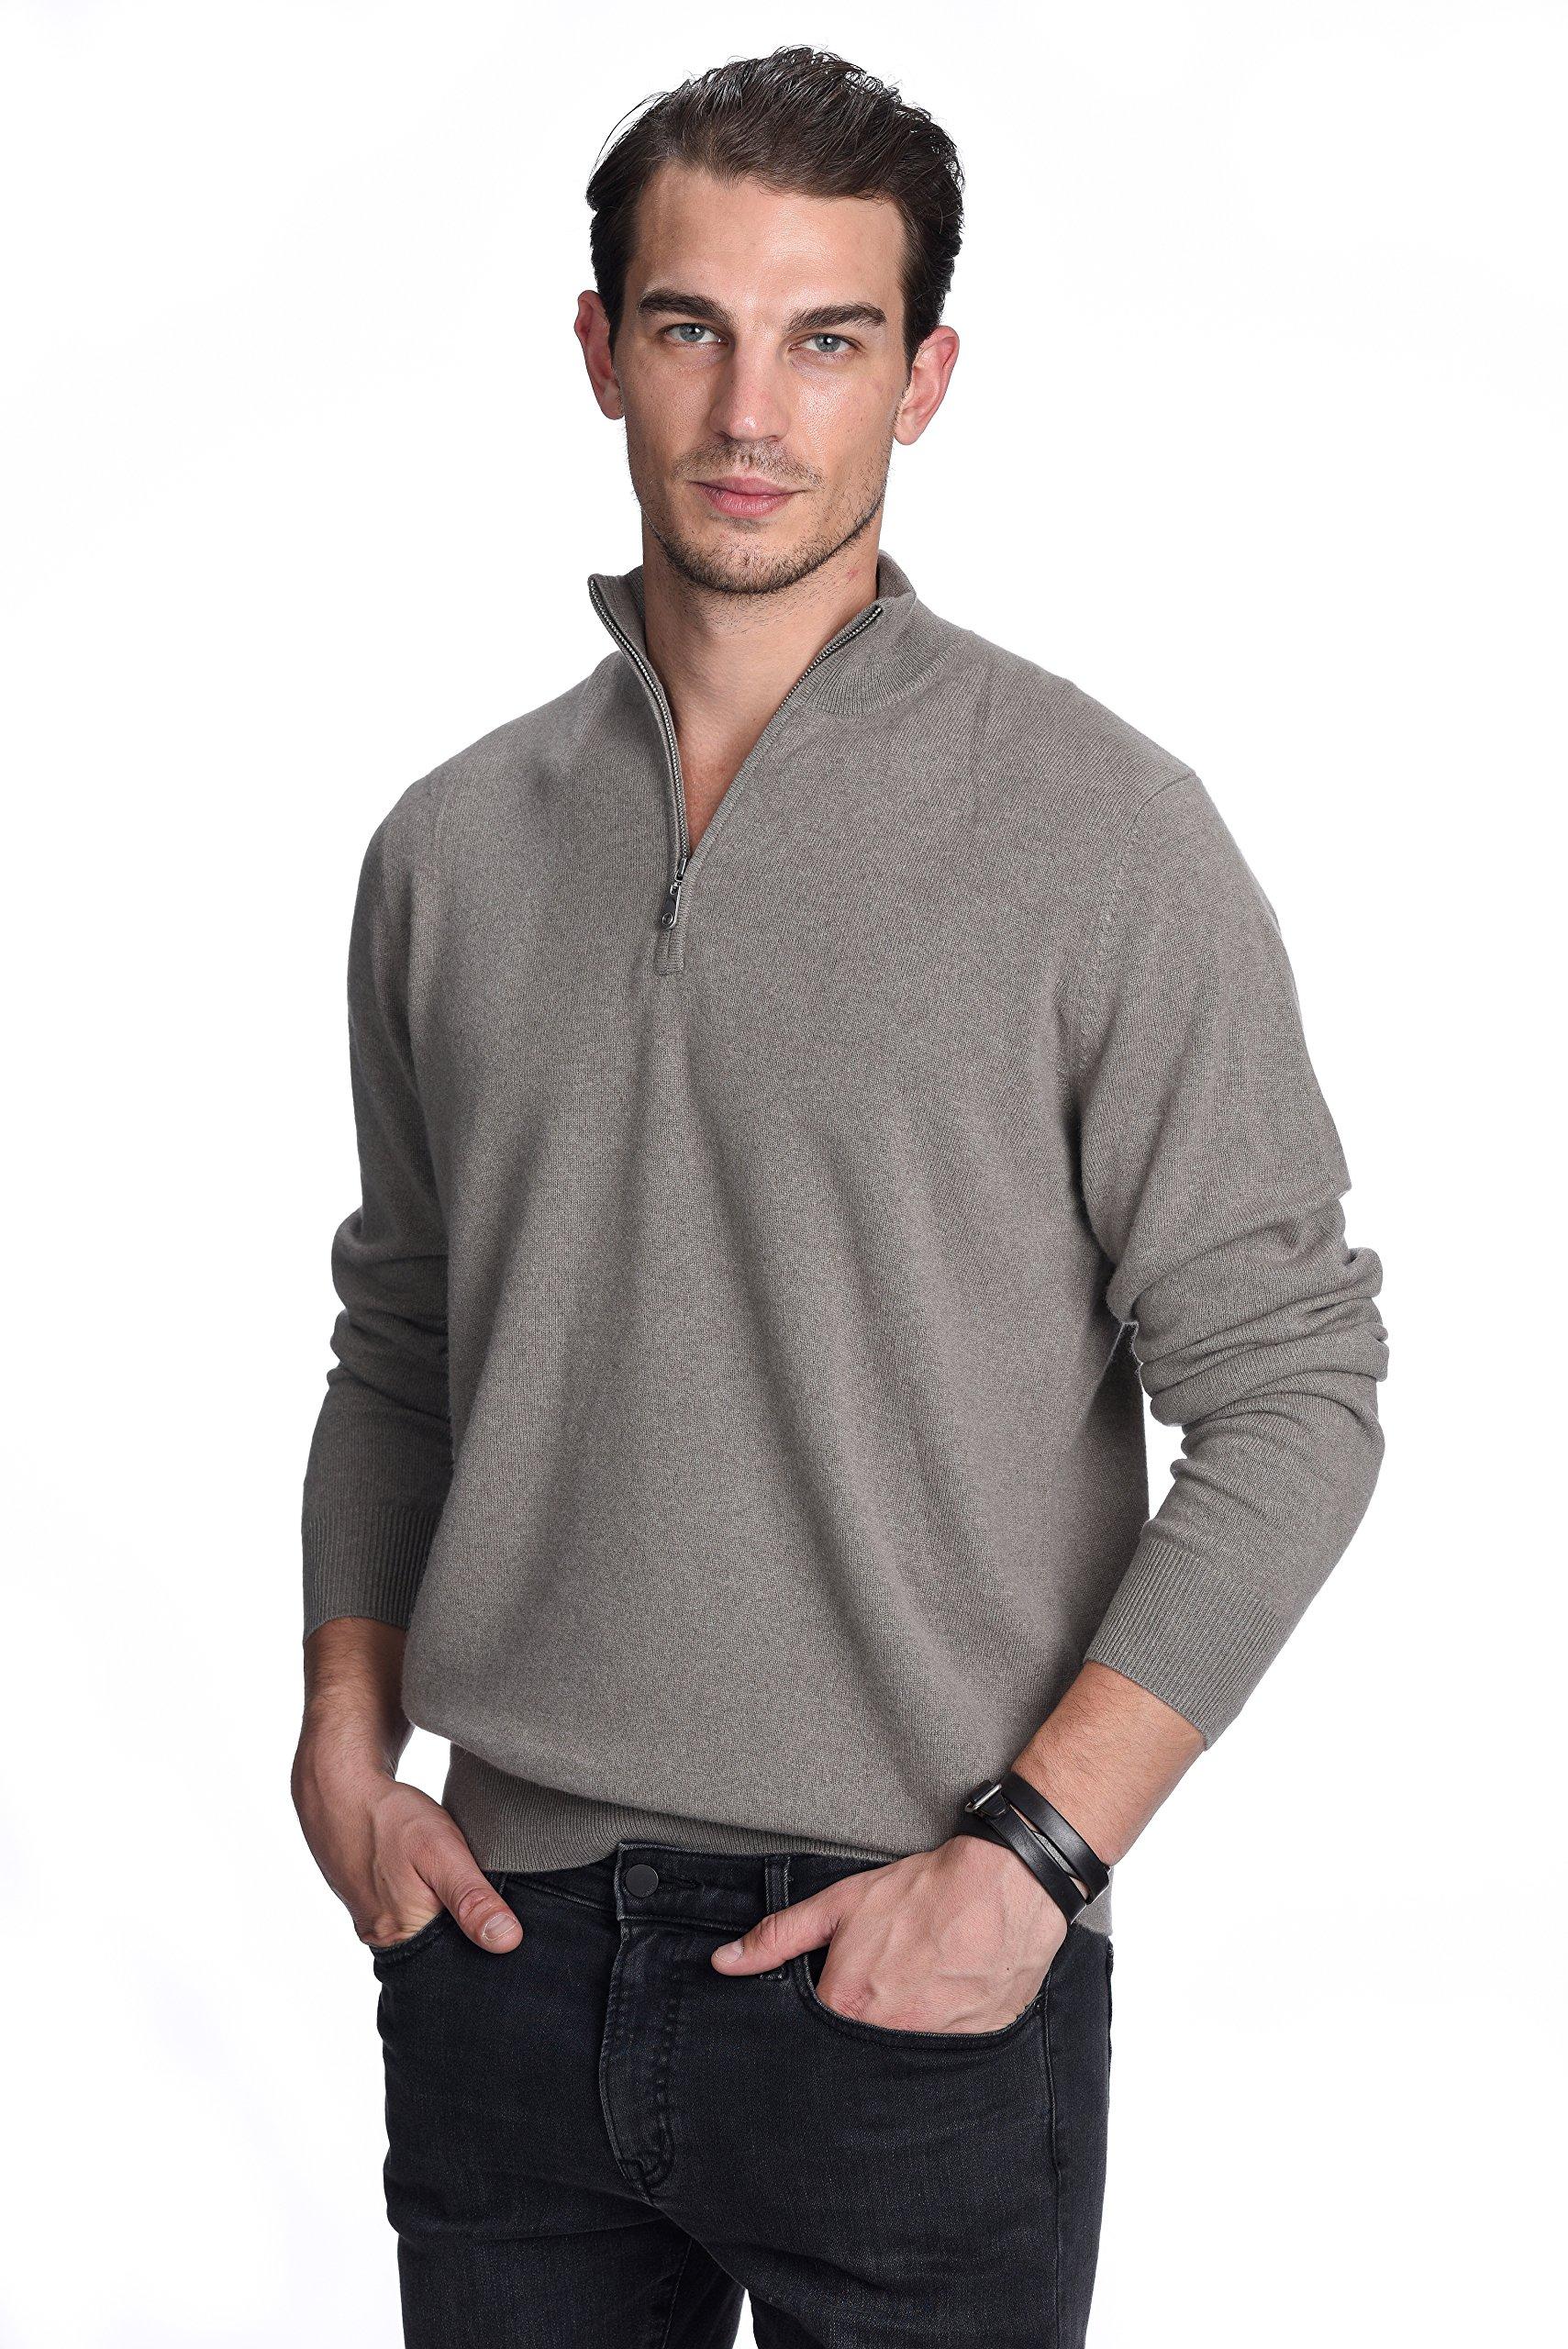 State Cashmere Men's 100% Pure Cashmere Pullover Half Zip Mock Neck Sweater (Small, Brown)